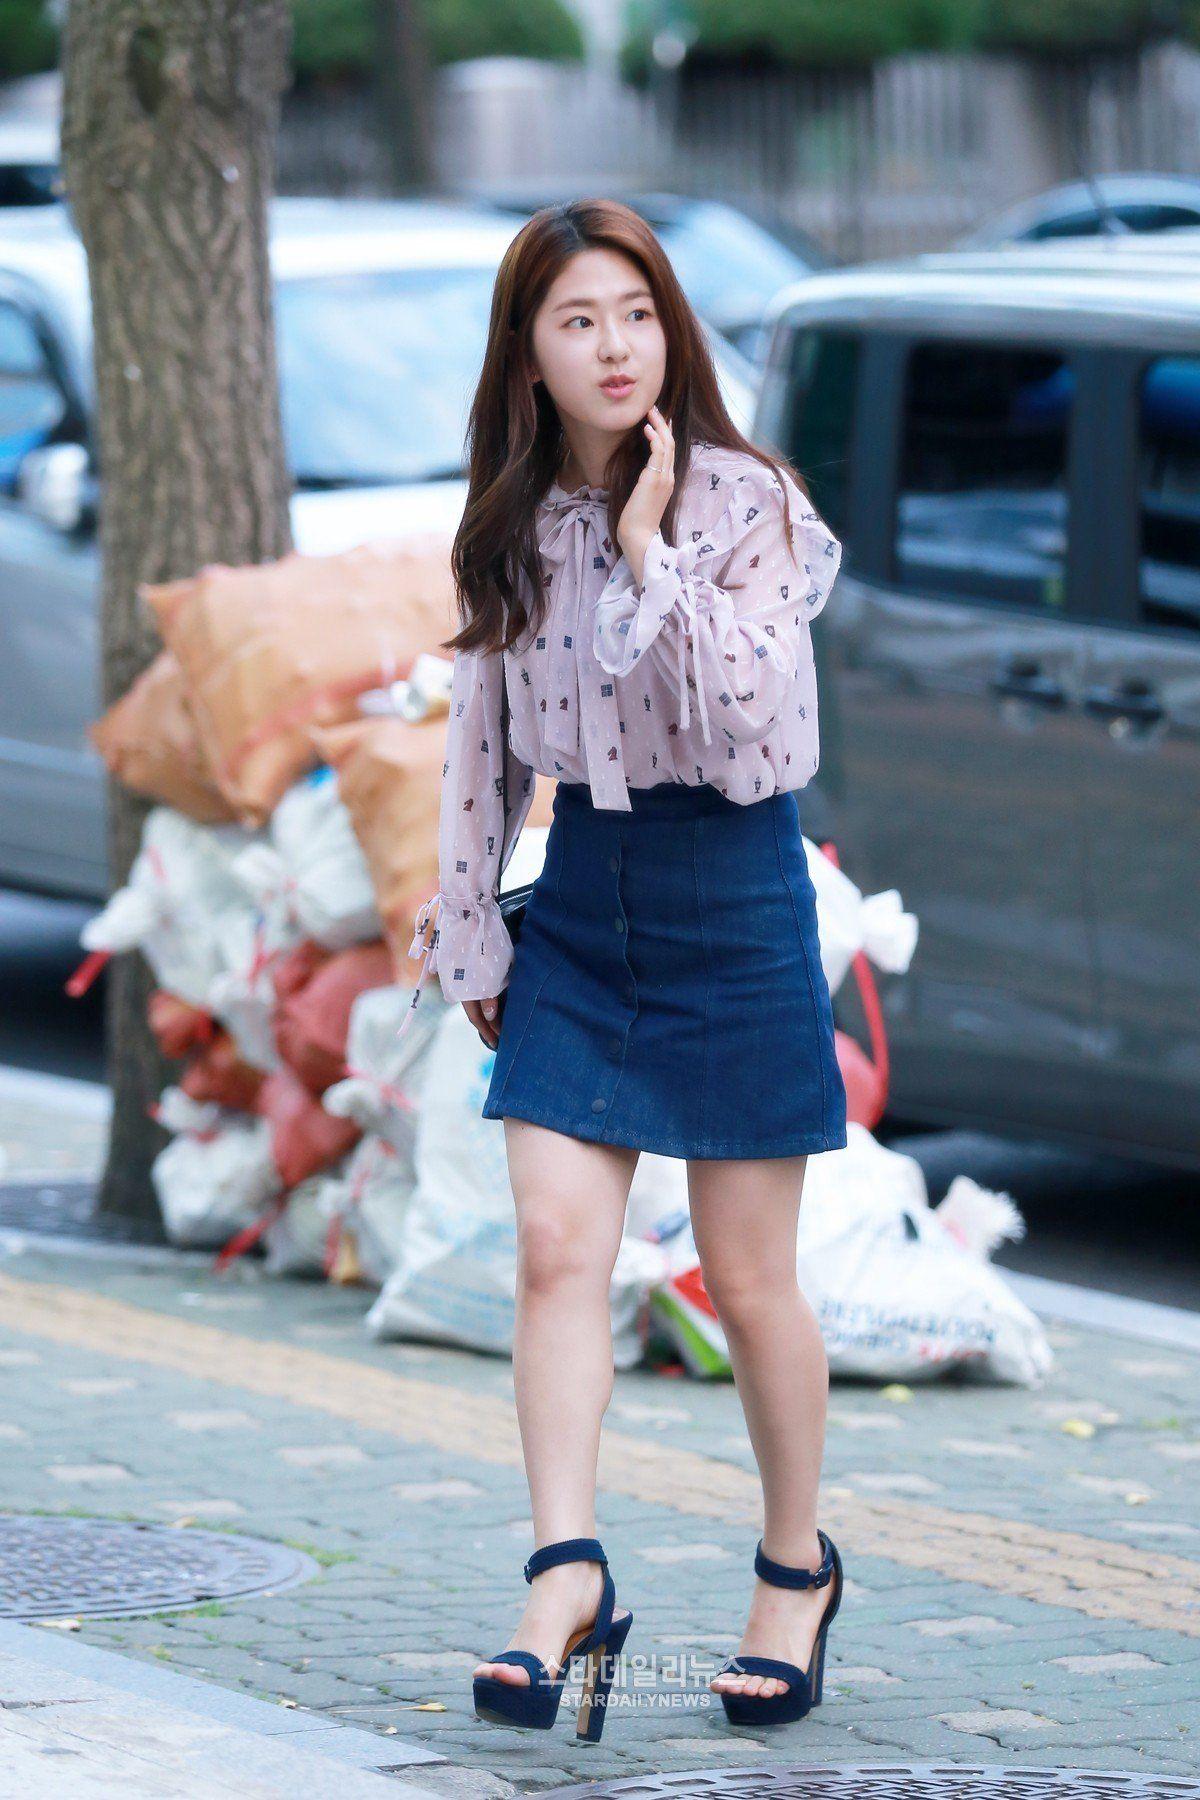 Intip Pesona Park Hye Soo, Lawan MainJaehyun NCT di Love Playlist 5